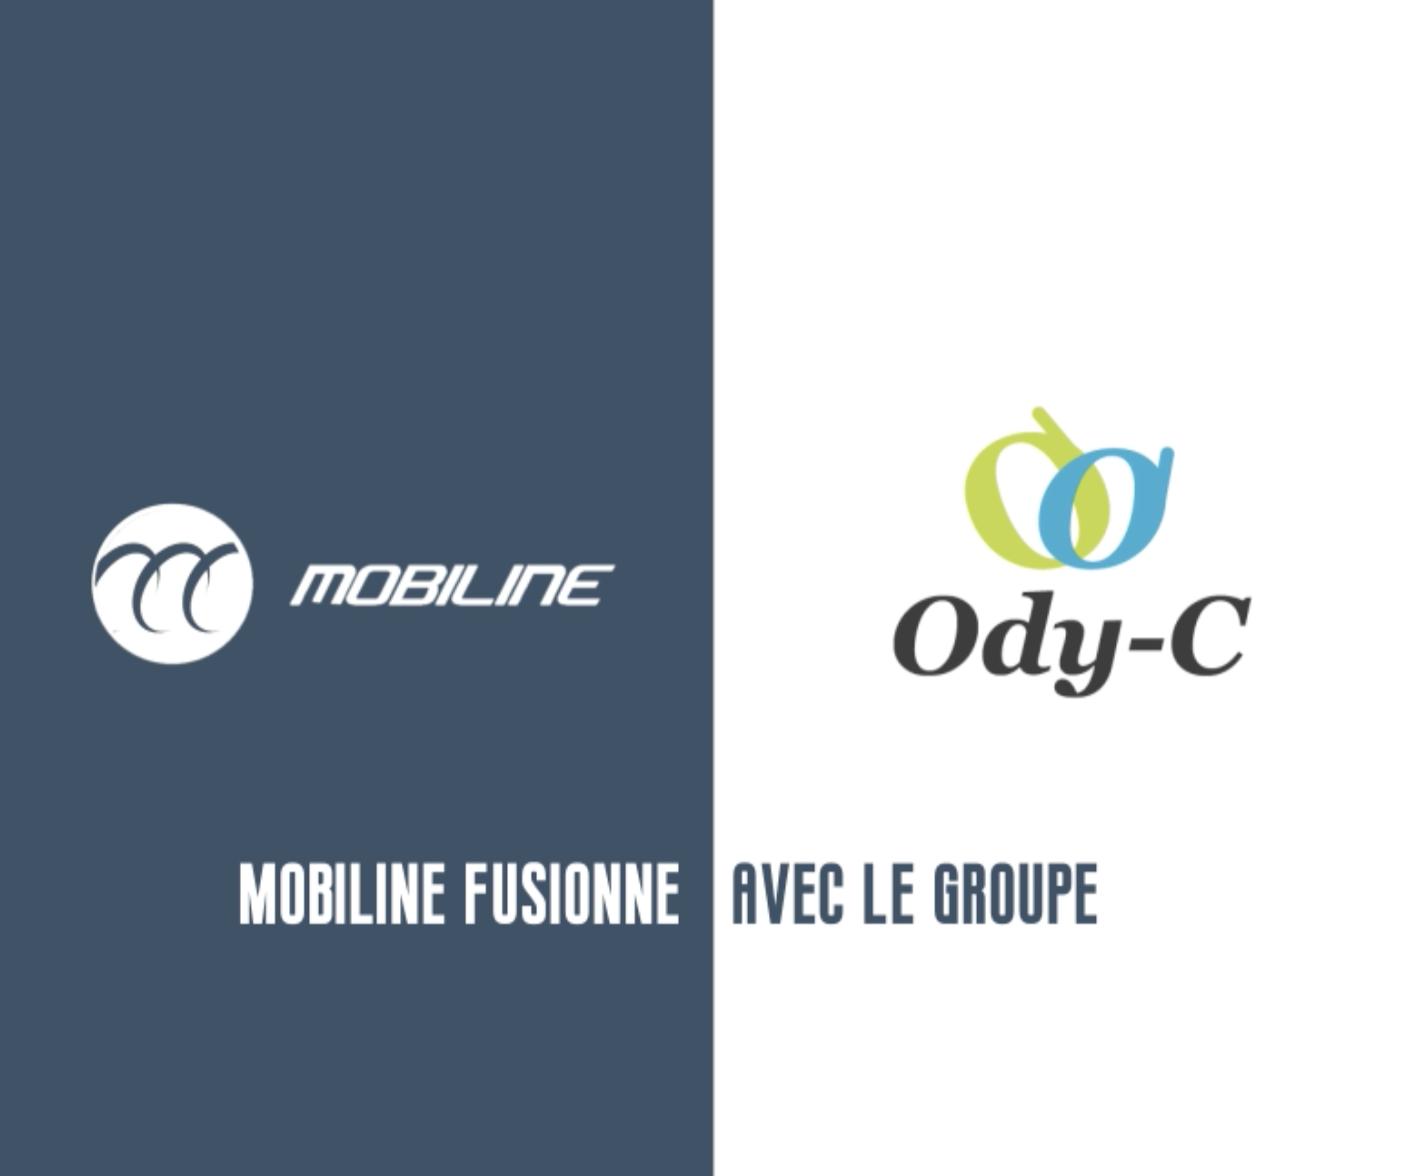 Mobiline-devient-Ody-C